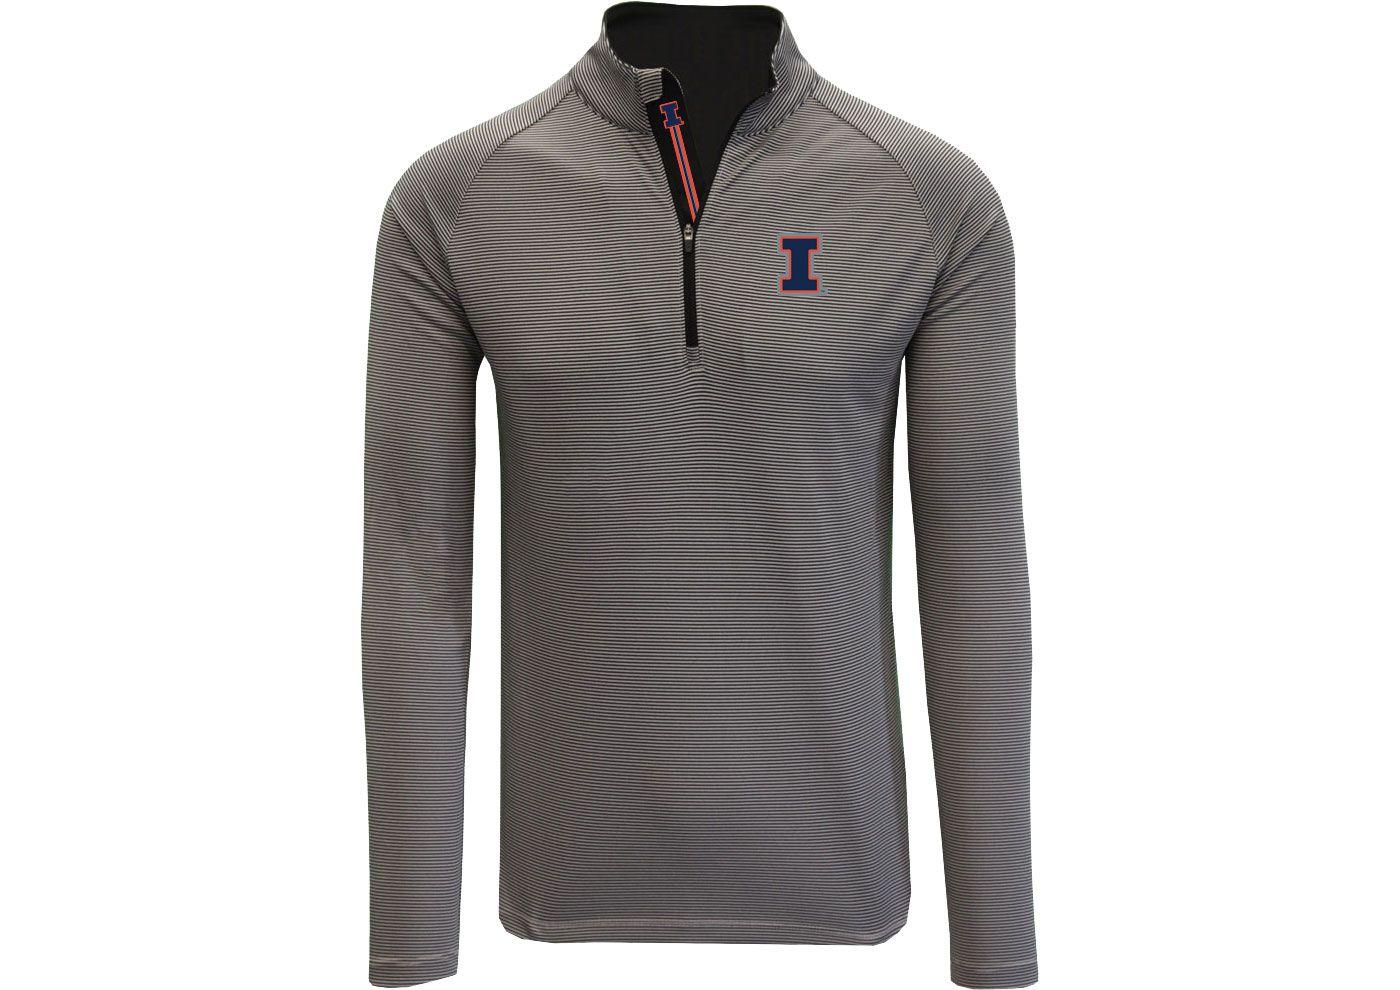 Levelwear Men's Illinois Fighting Illini Gold Orion Quarter-Zip Shirt